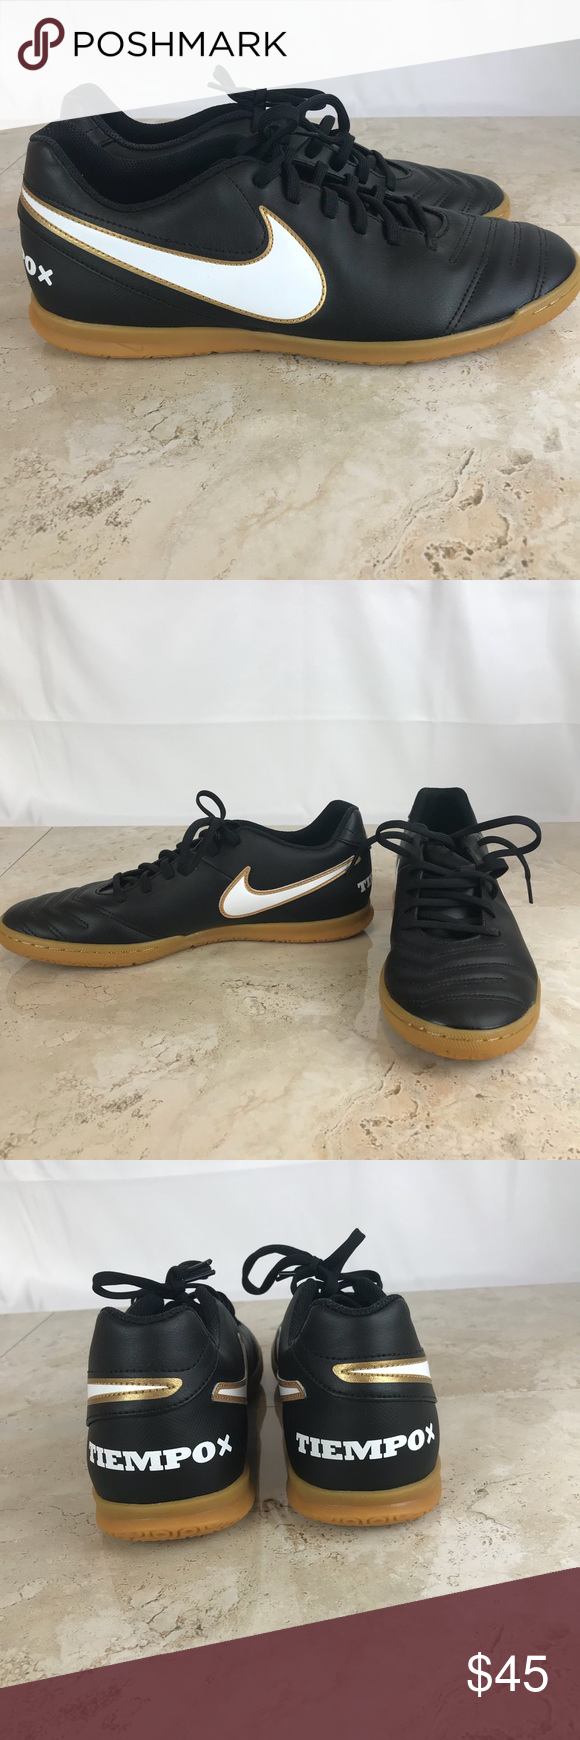 3c8027da2c1 Nike Tiempo Rio III IC Indoor Soccer Shoe men s 10 New in box Never worn  Men s size 10 Cleats Nike Shoes